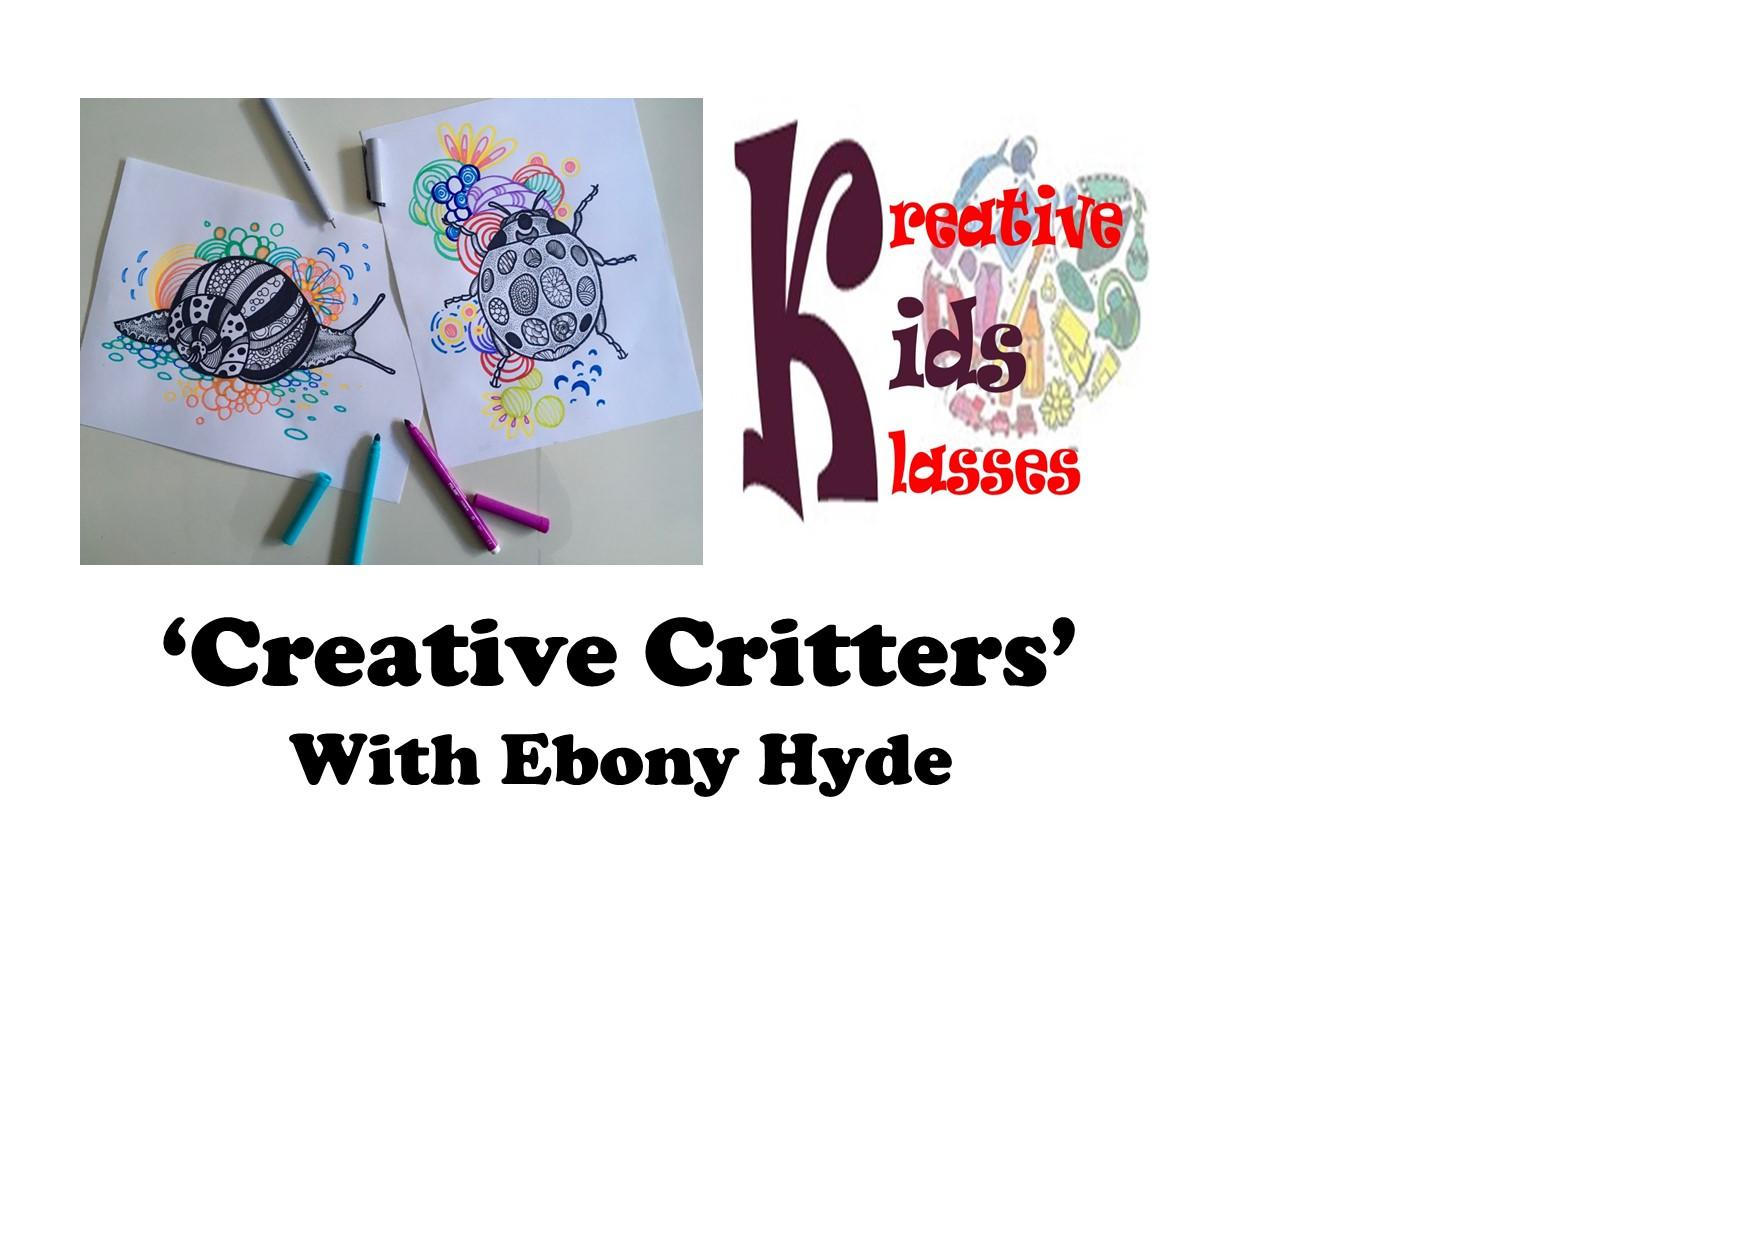 Creative Critters Drawing Class with Ebony Hyde – Kreative Kids Klasses